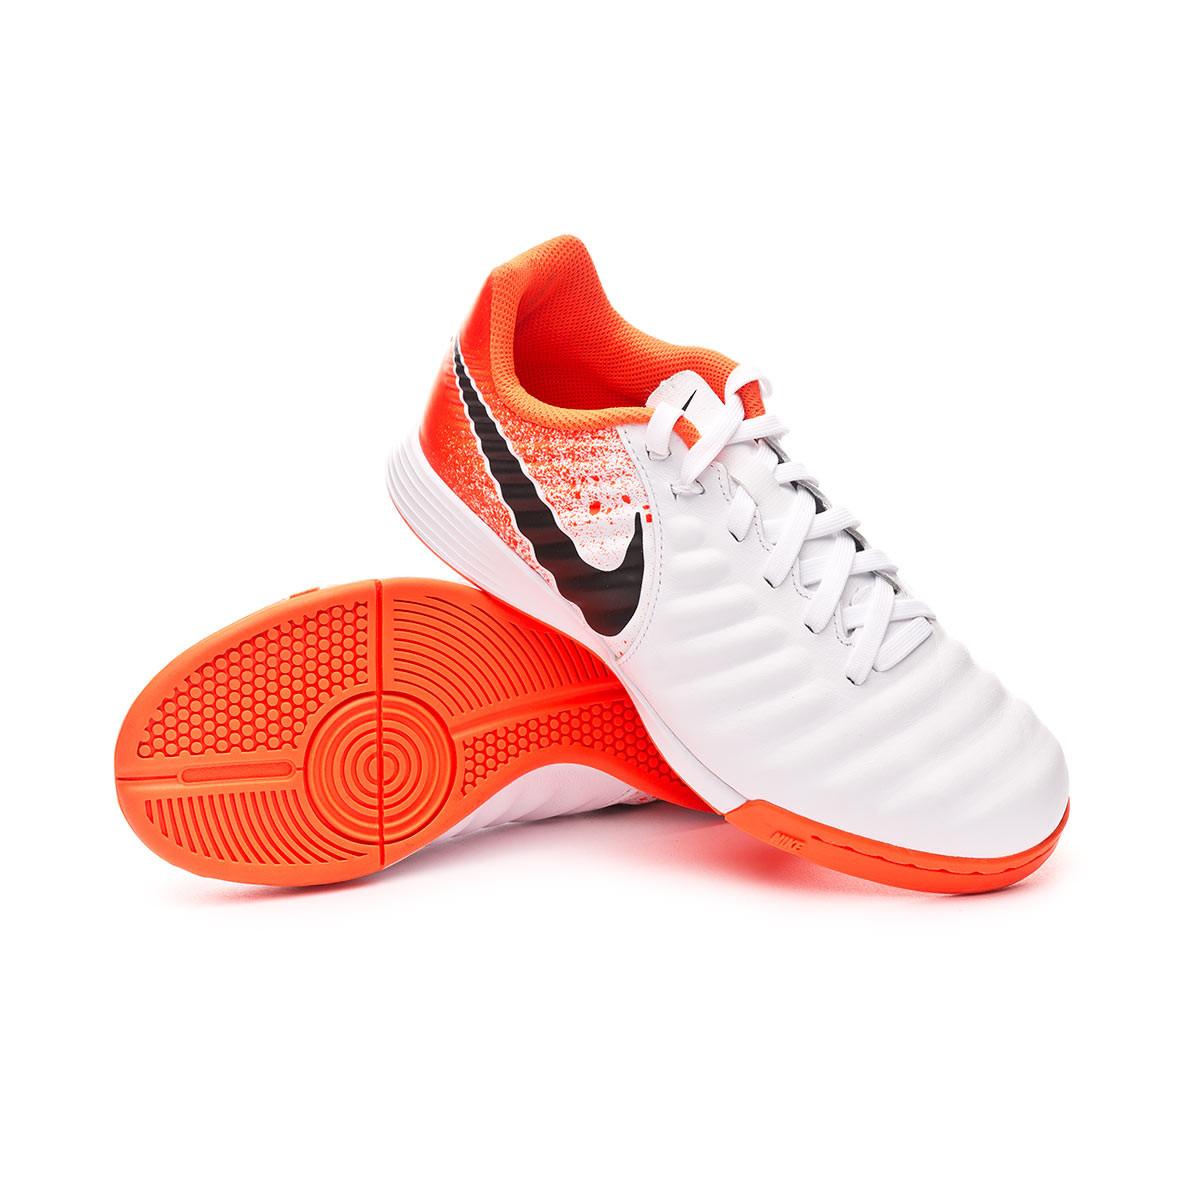 aad1a25209f Nike Tiempo LegendX VII Academy IC Niño Futsal Boot. White-Black-Hyper ...